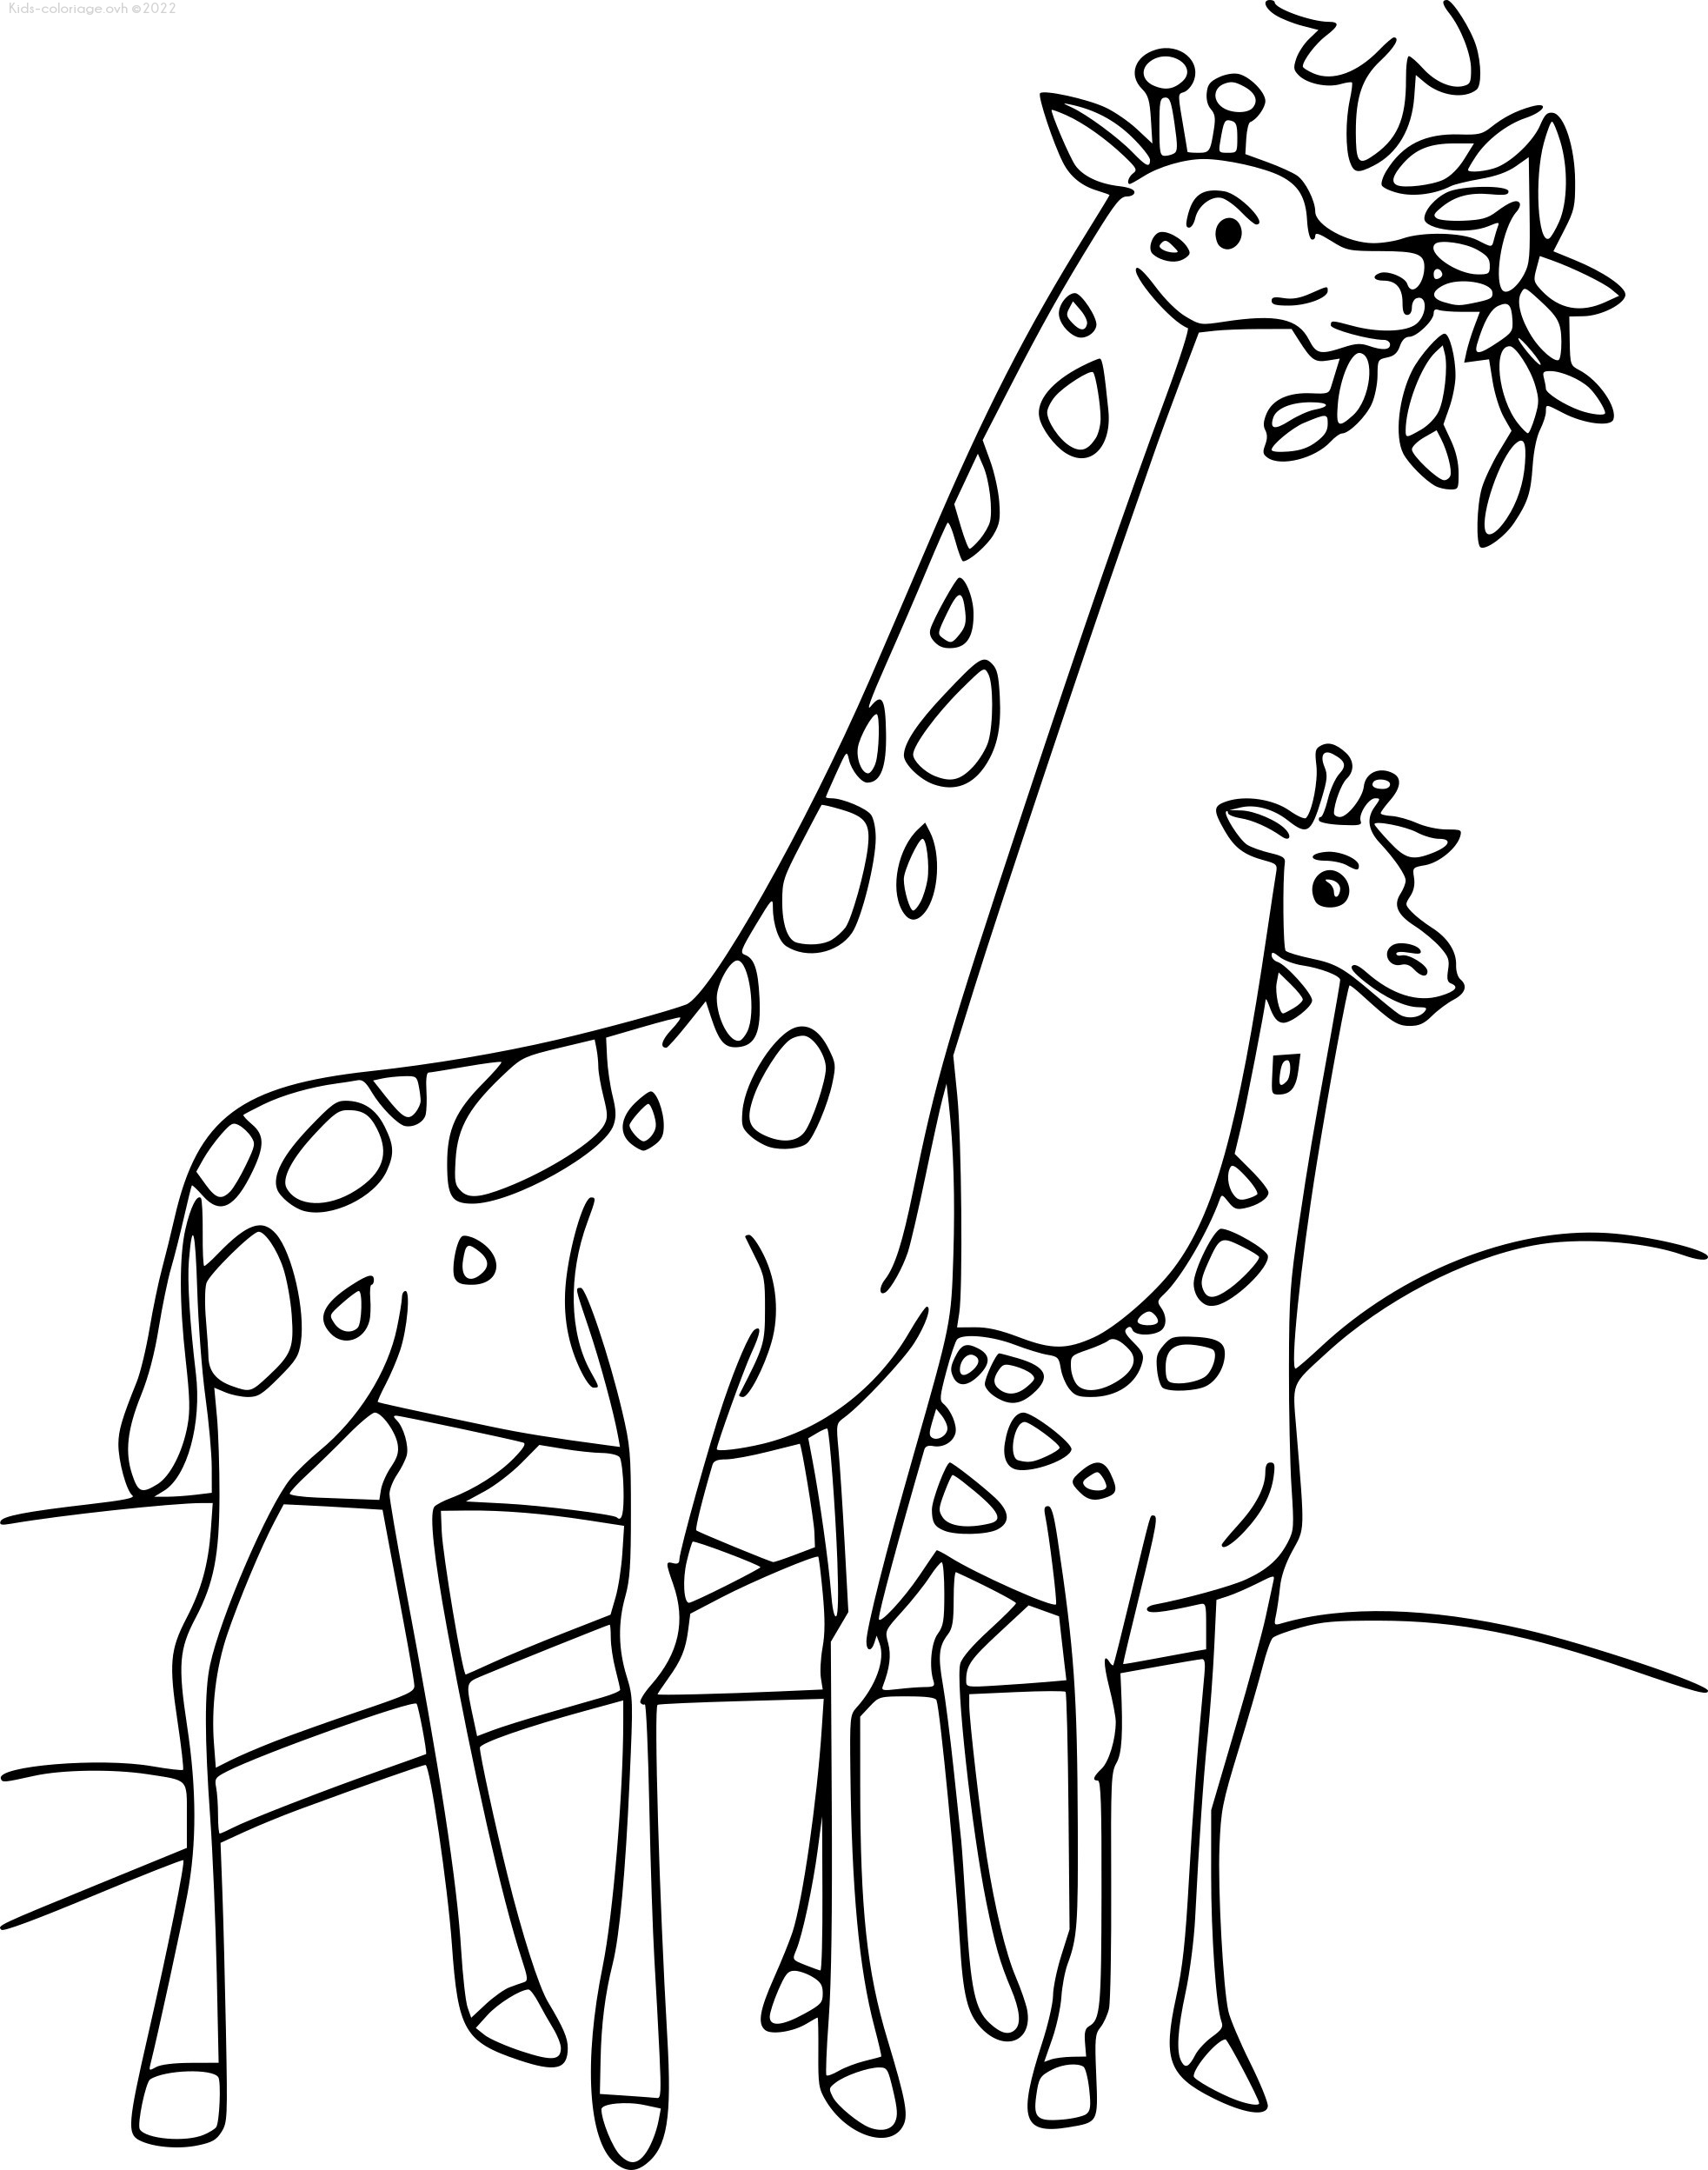 Beau Image Girafe Coloriage